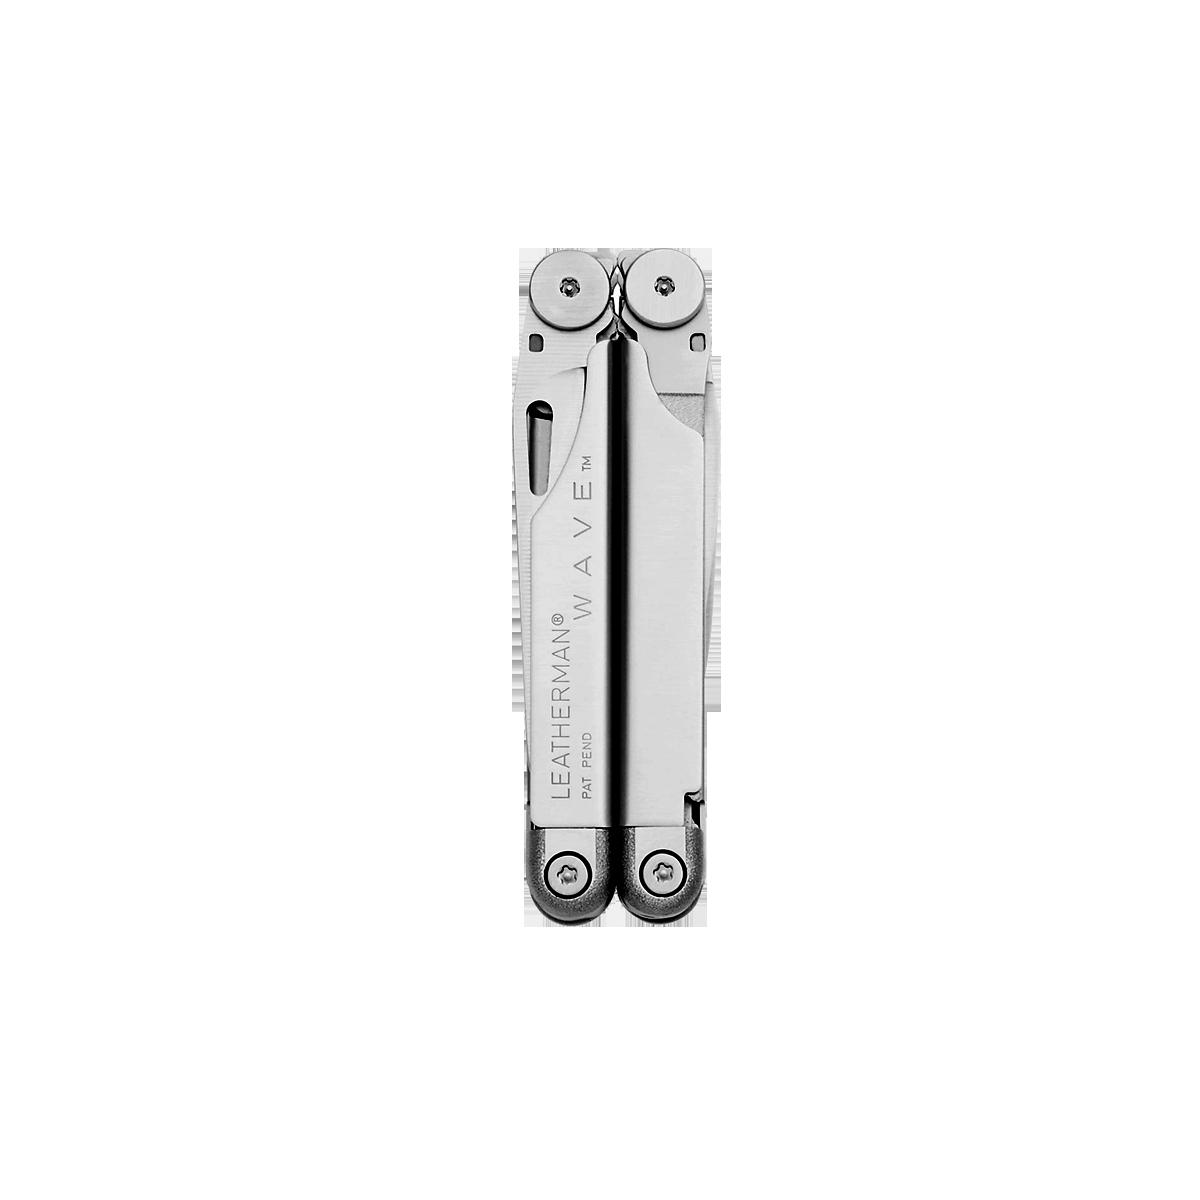 Leatherman original wave multi-tool, stainless steel, closed view